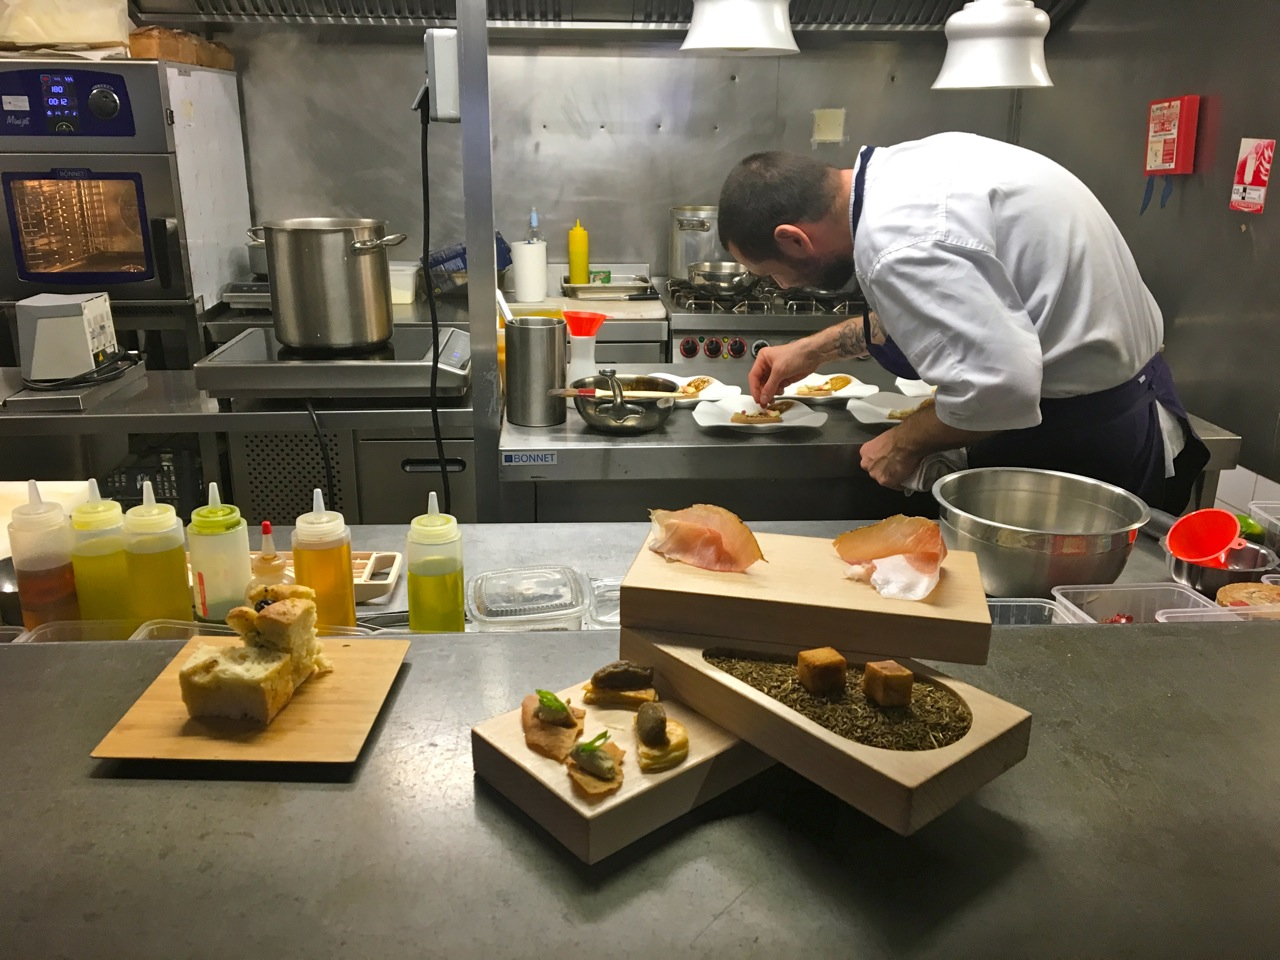 Restaurant gastronomique marseille